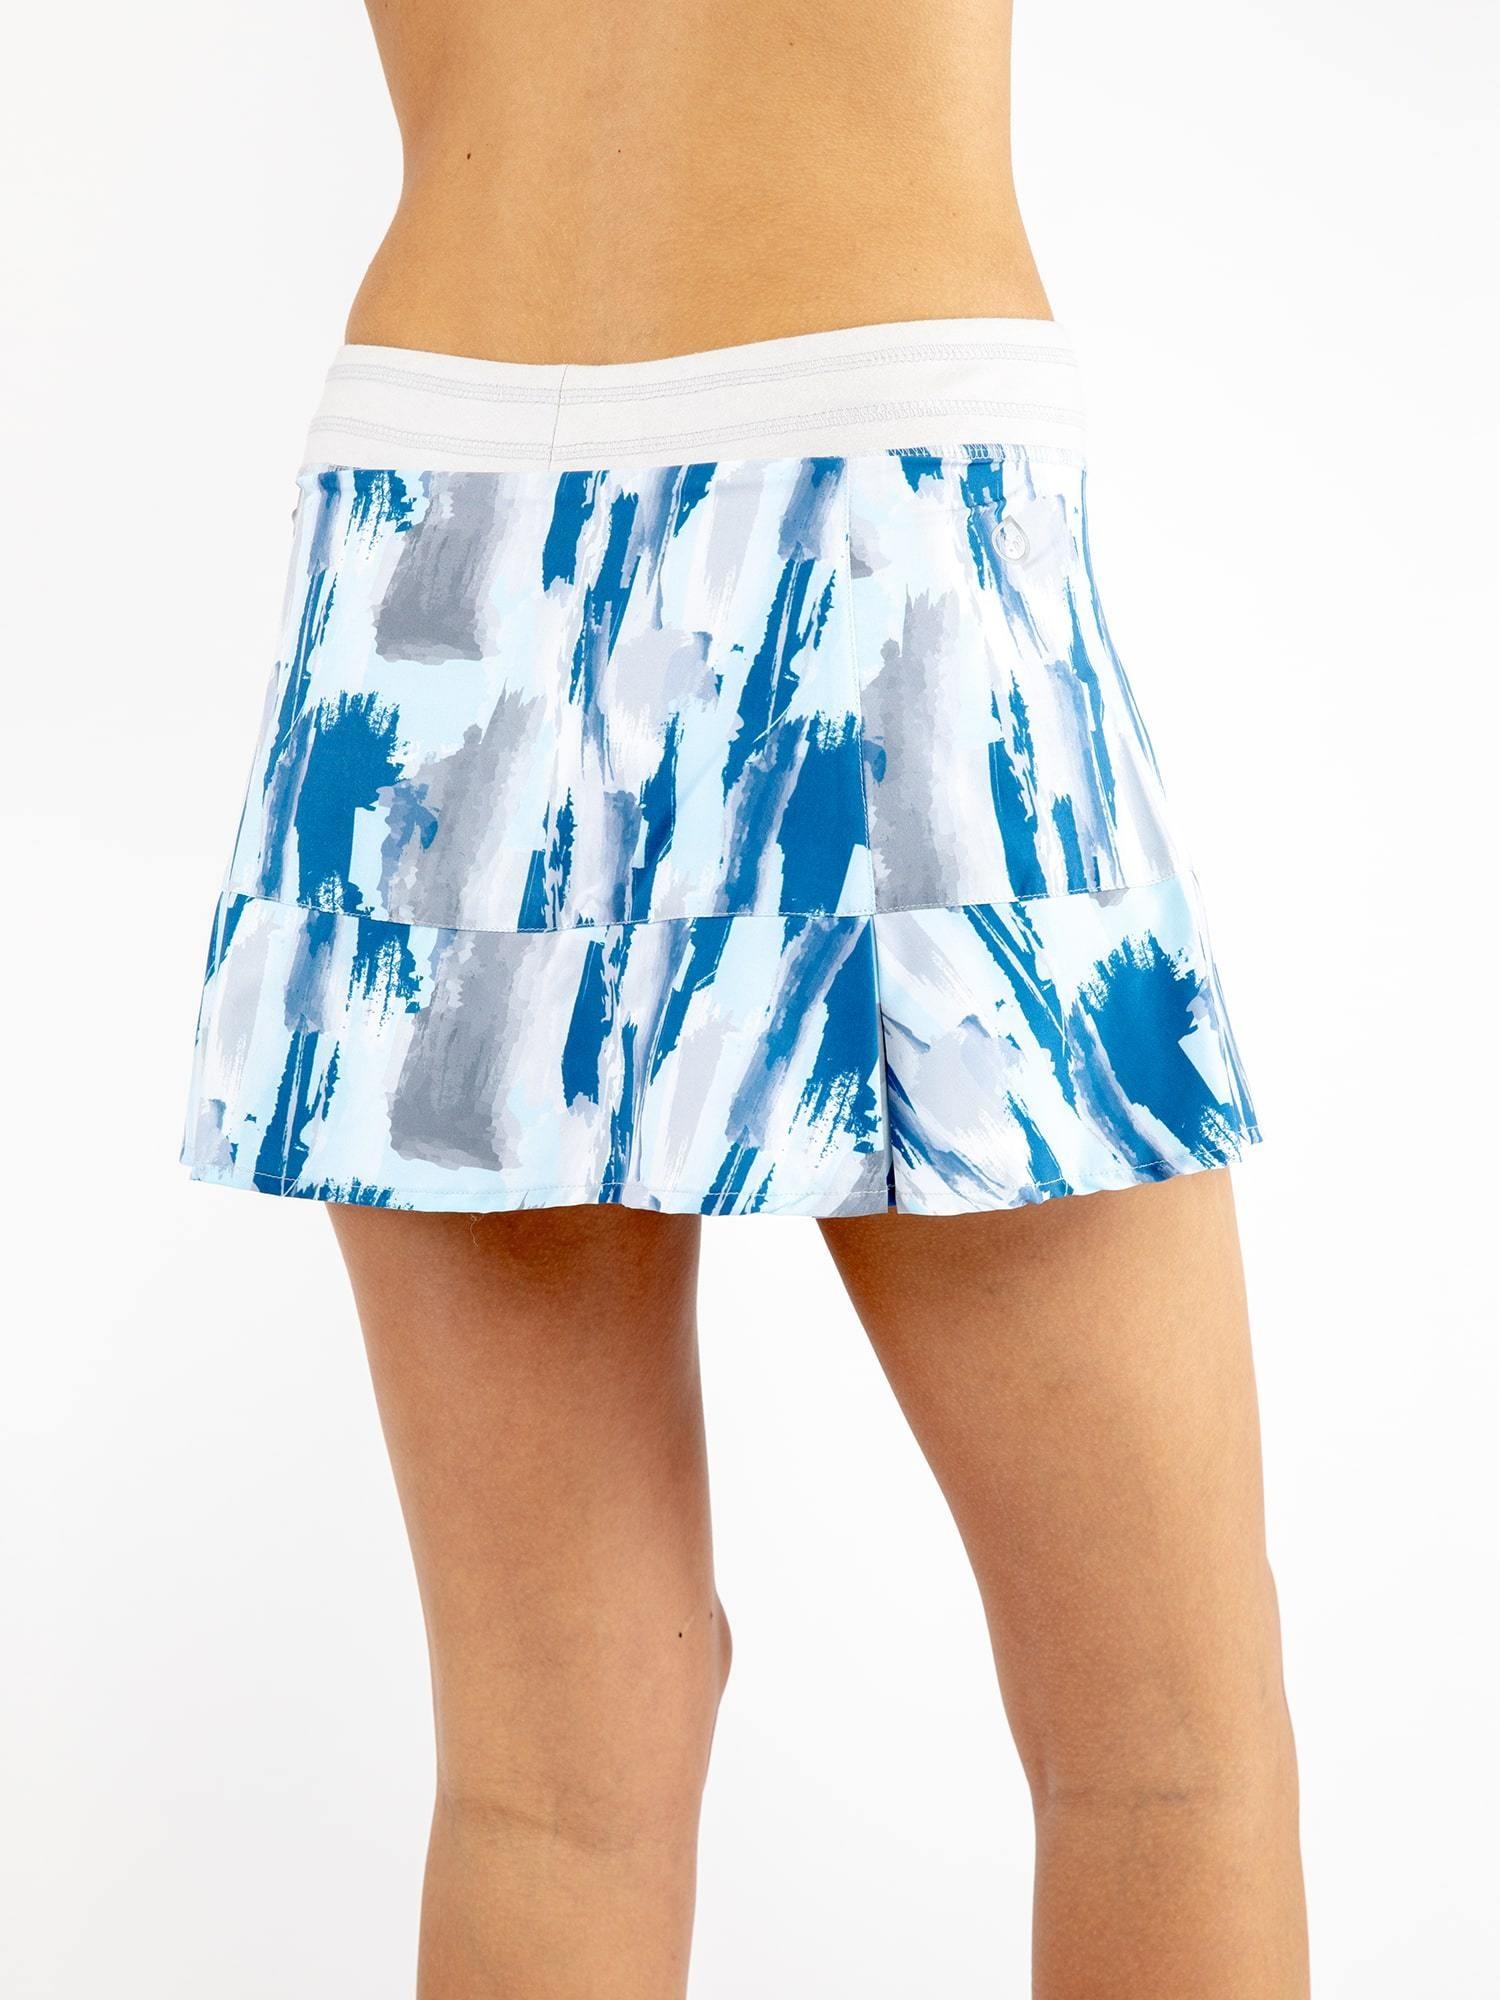 Tasc Performance Rhythm II Skirt, Violet Brushstrokes